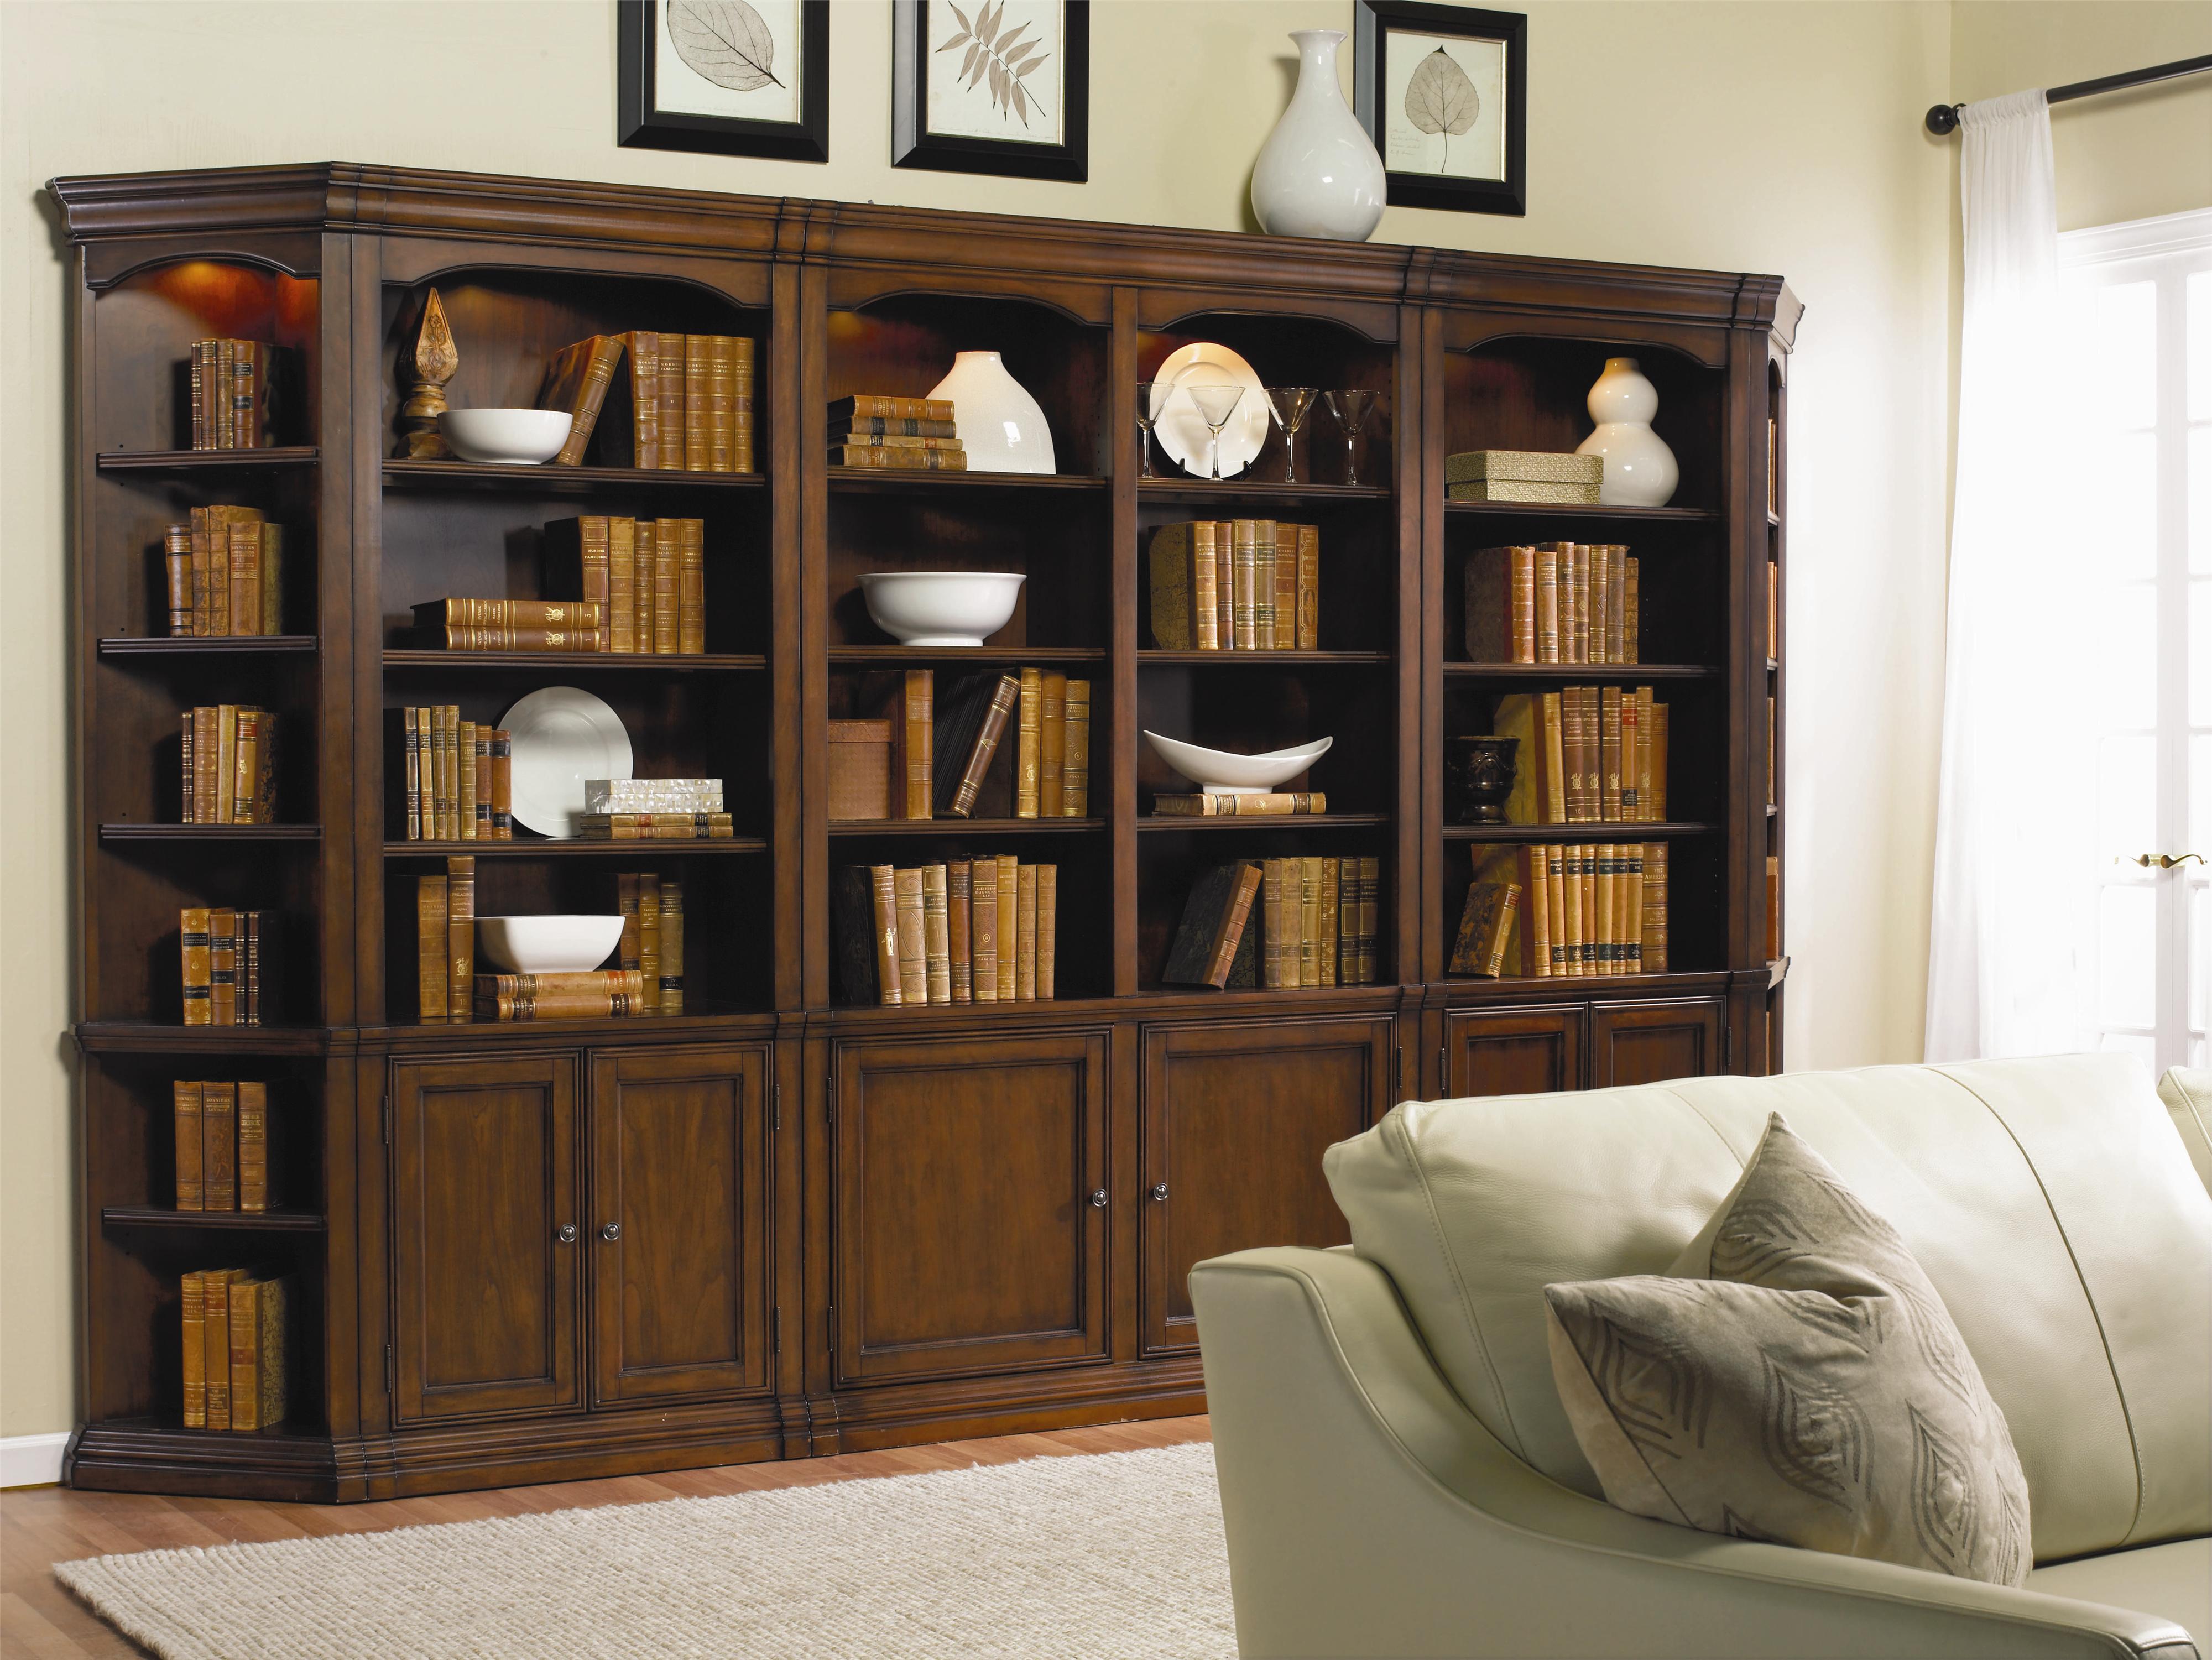 Hooker Furniture Cherry Creek Traditional Bookcase Modular